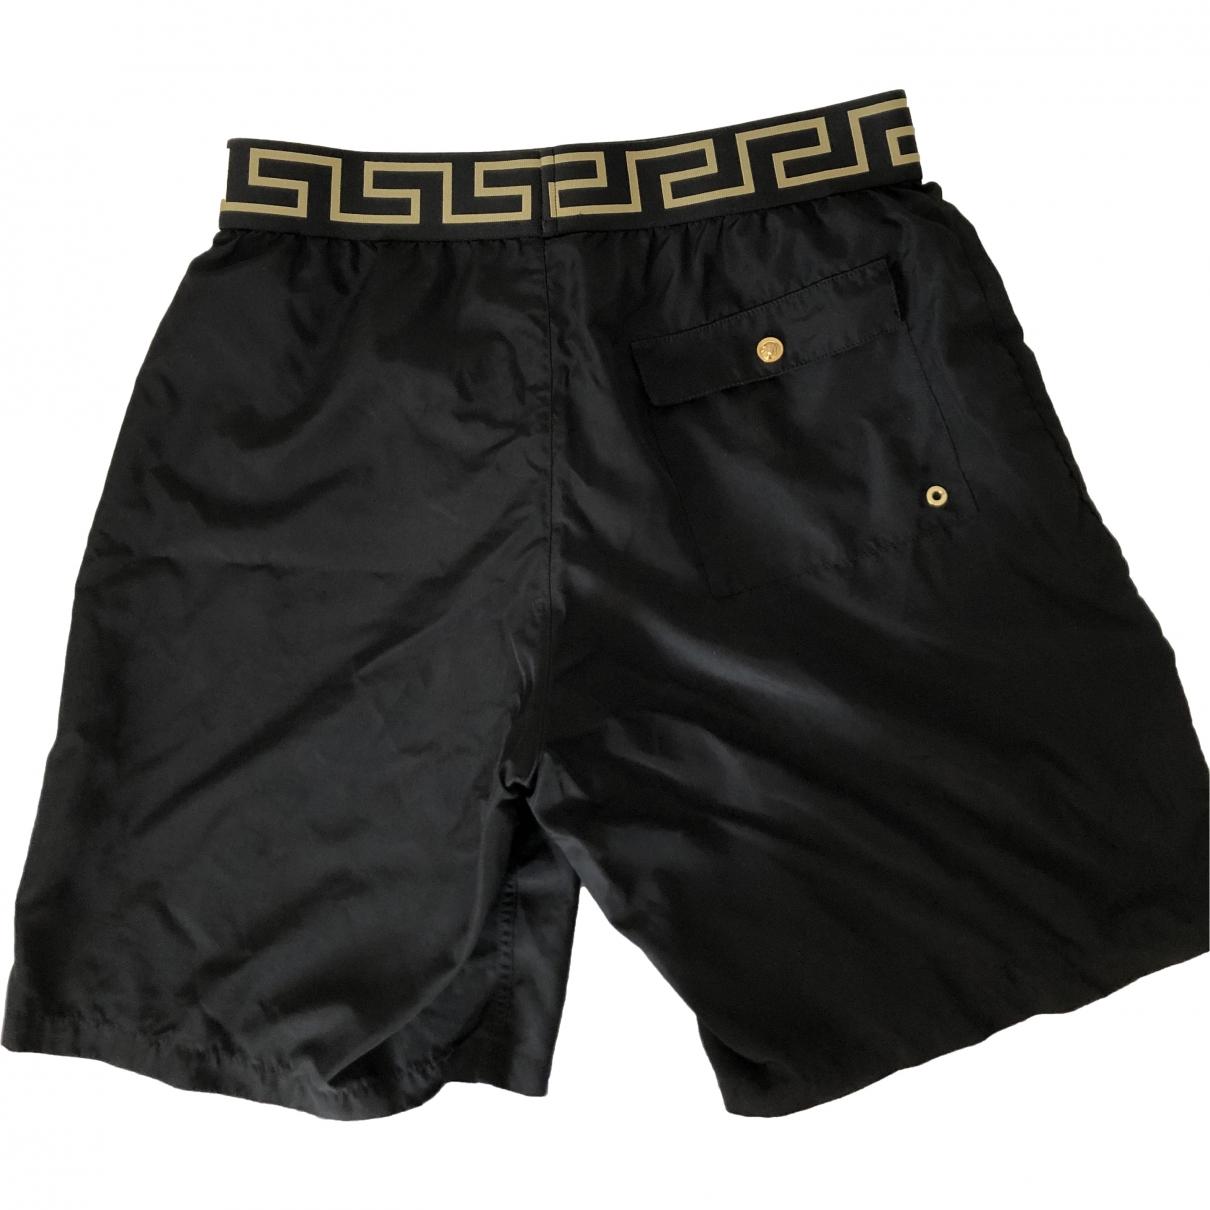 Versace \N Black Swimwear for Men S International